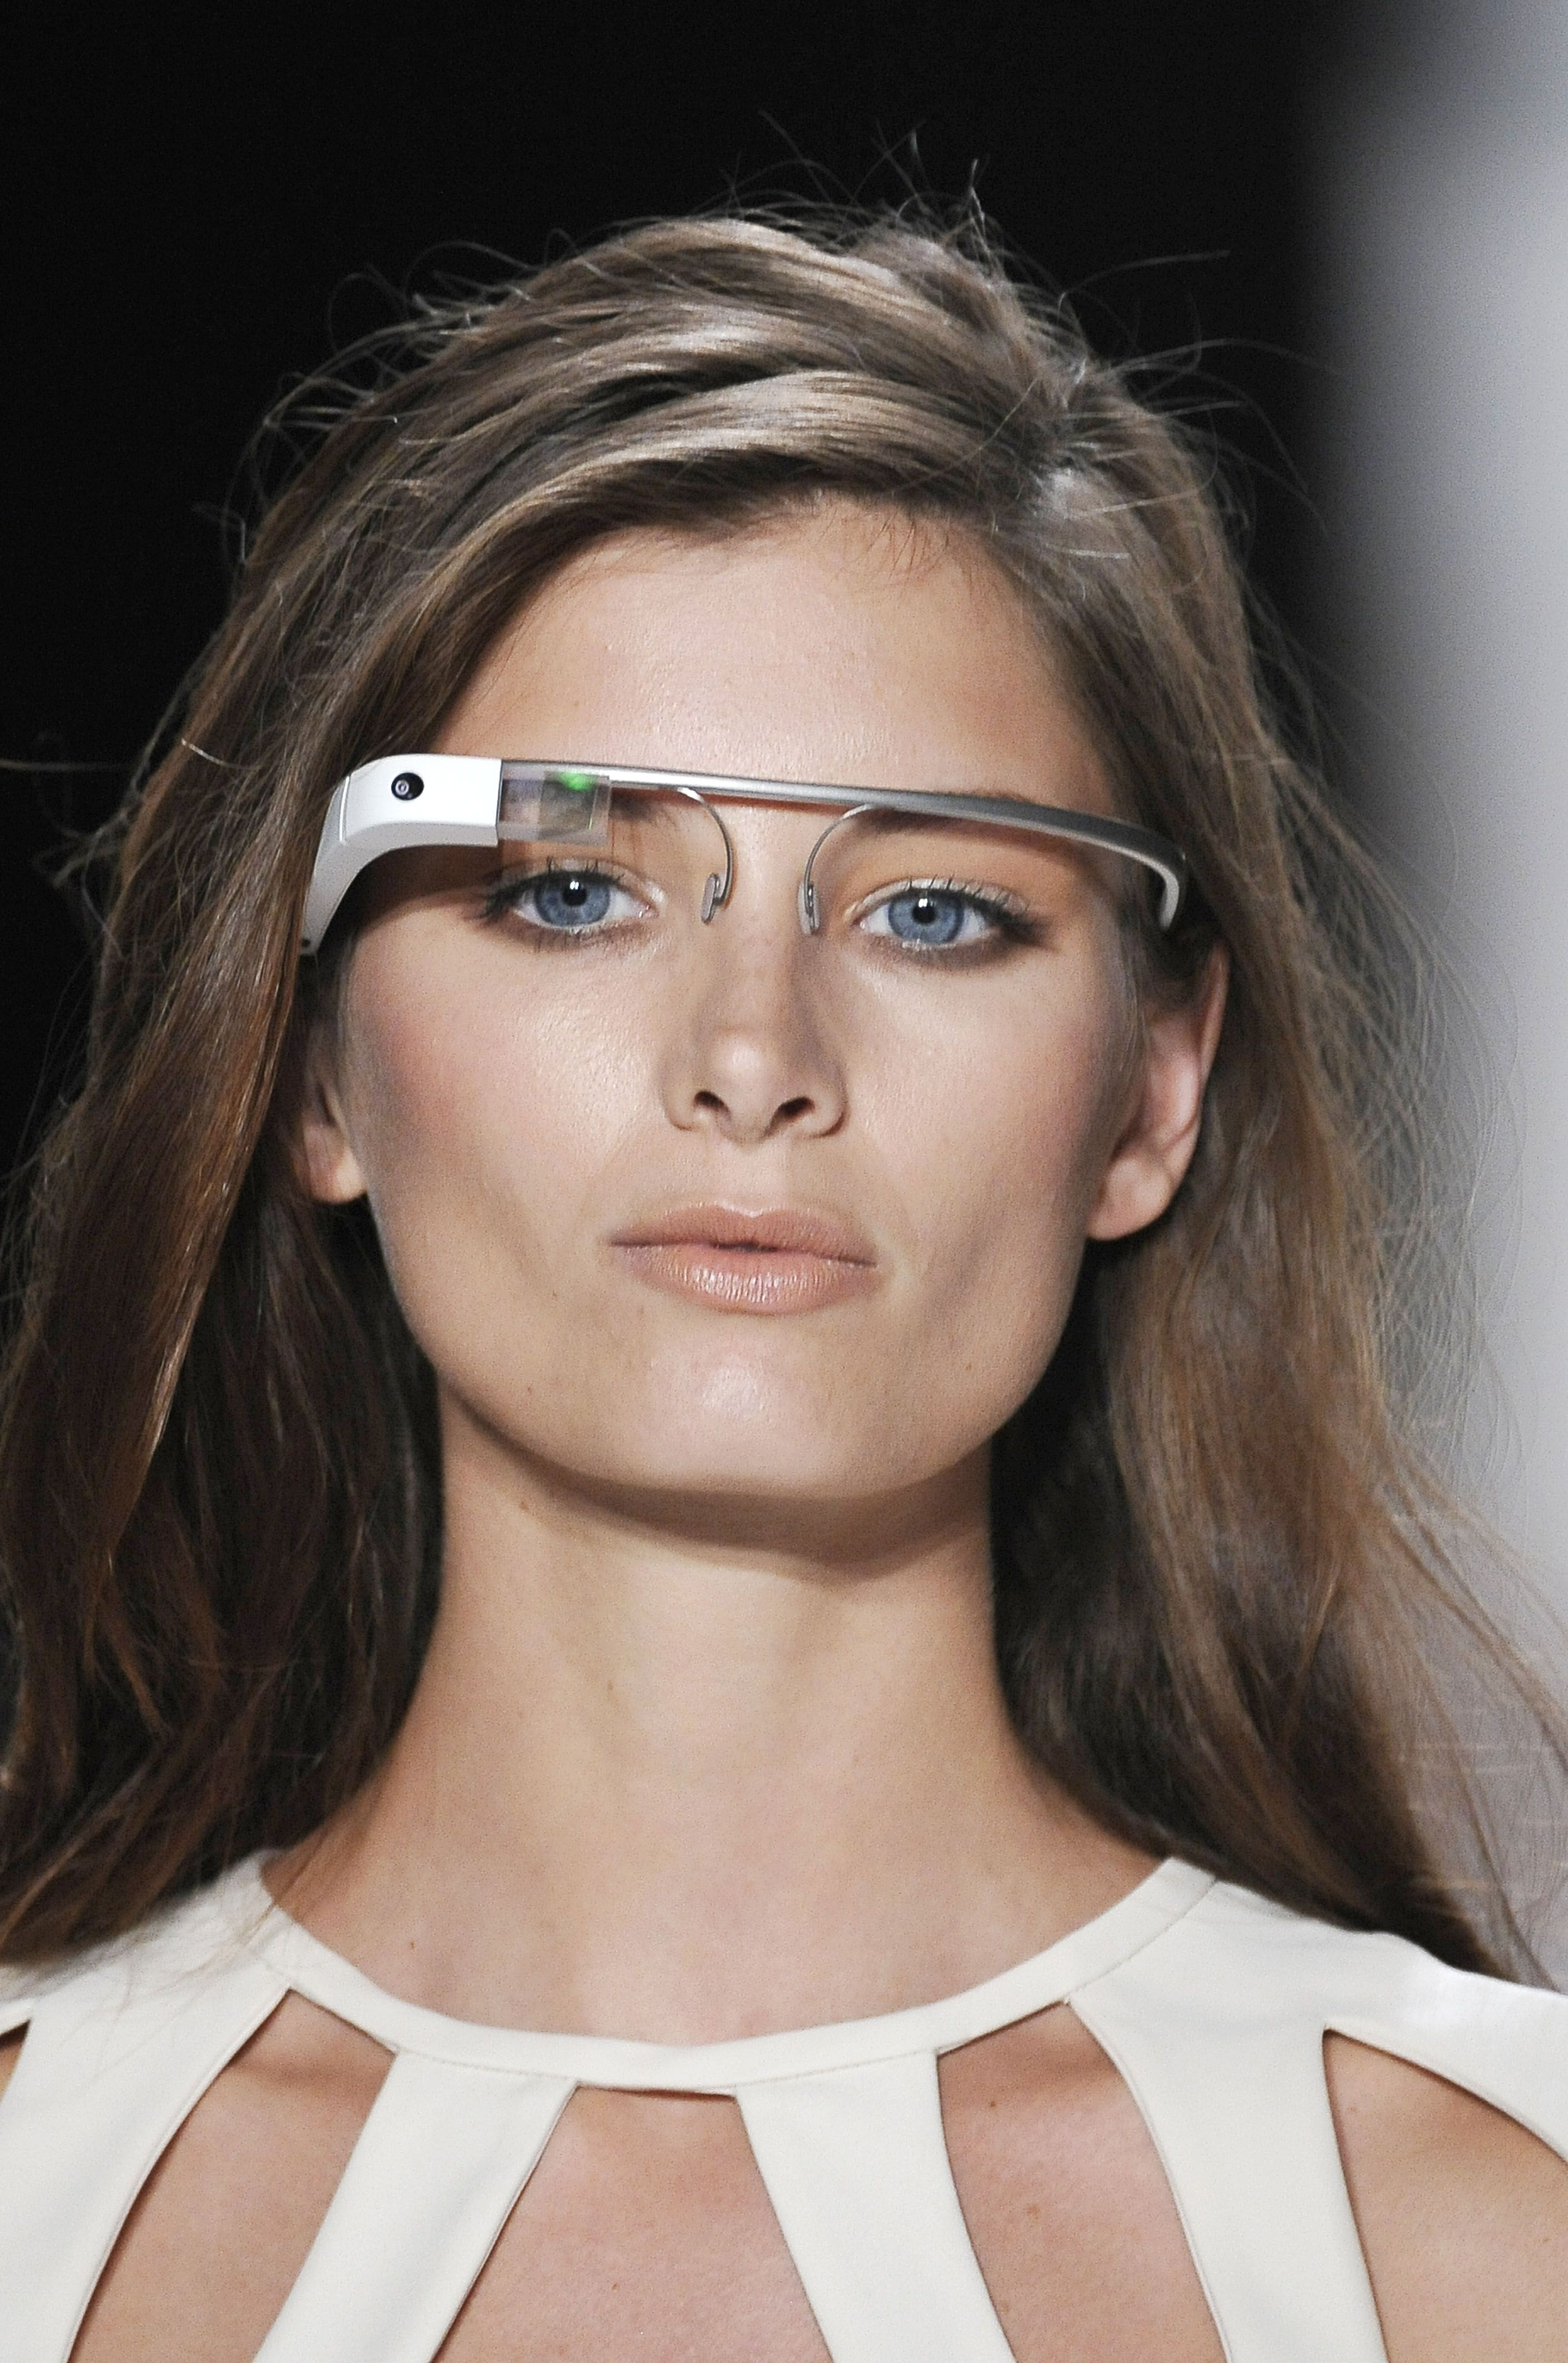 Virtual fashion course